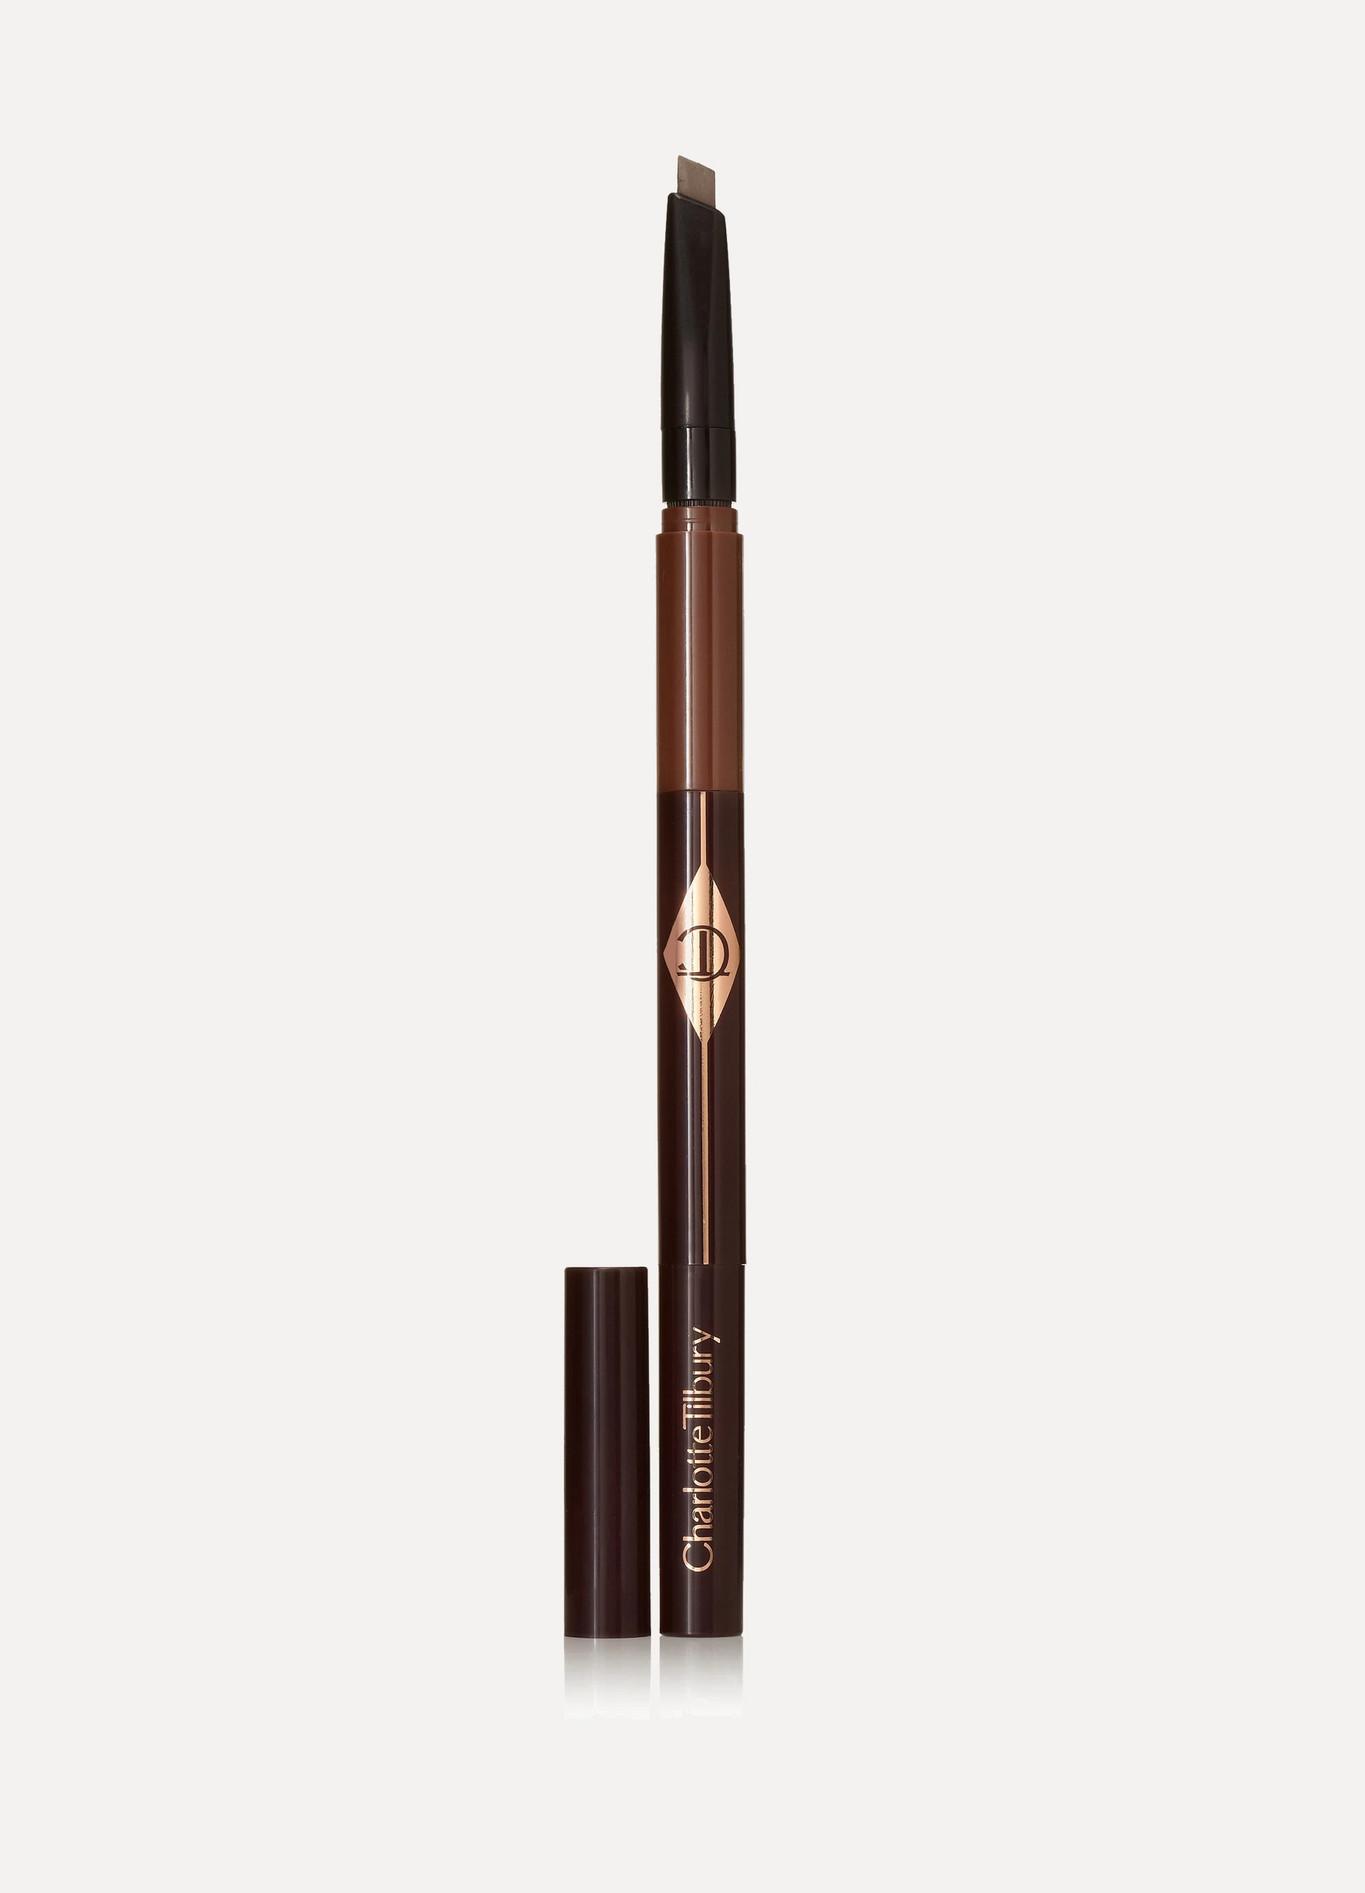 CHARLOTTE TILBURY - Brow Lift - Luscious Brow - Brown - one size